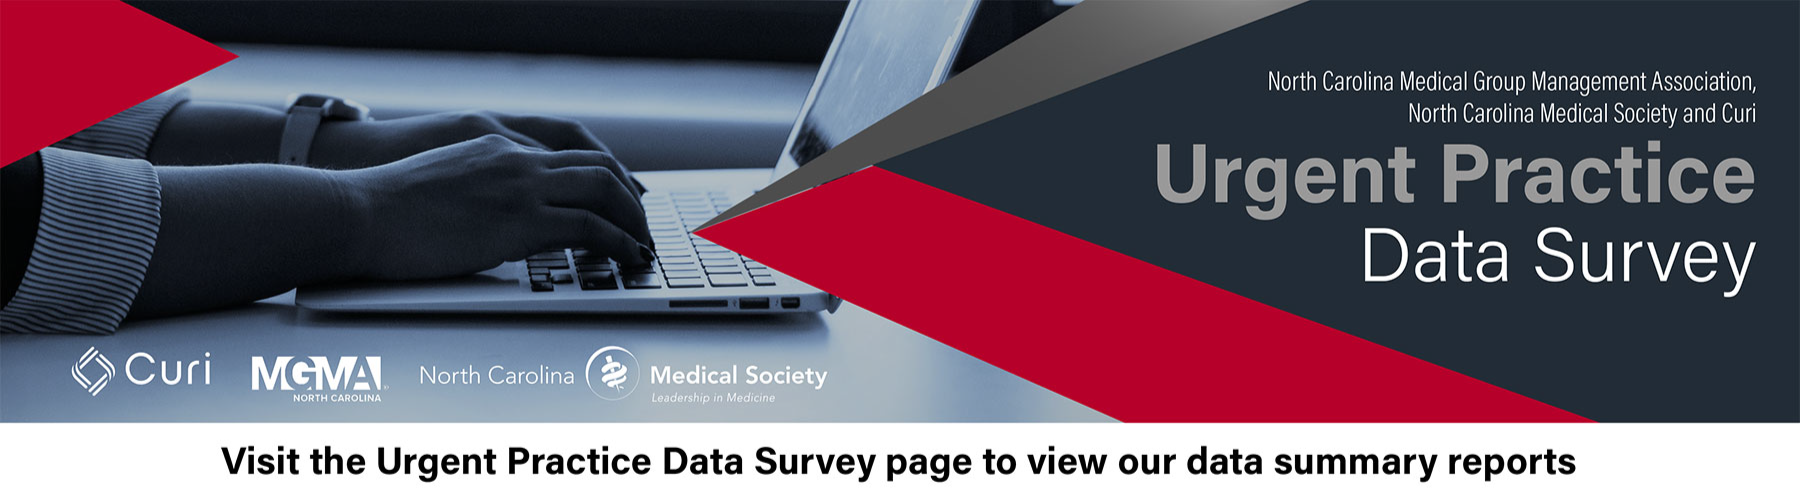 2020 Urgent Practice Data Survey